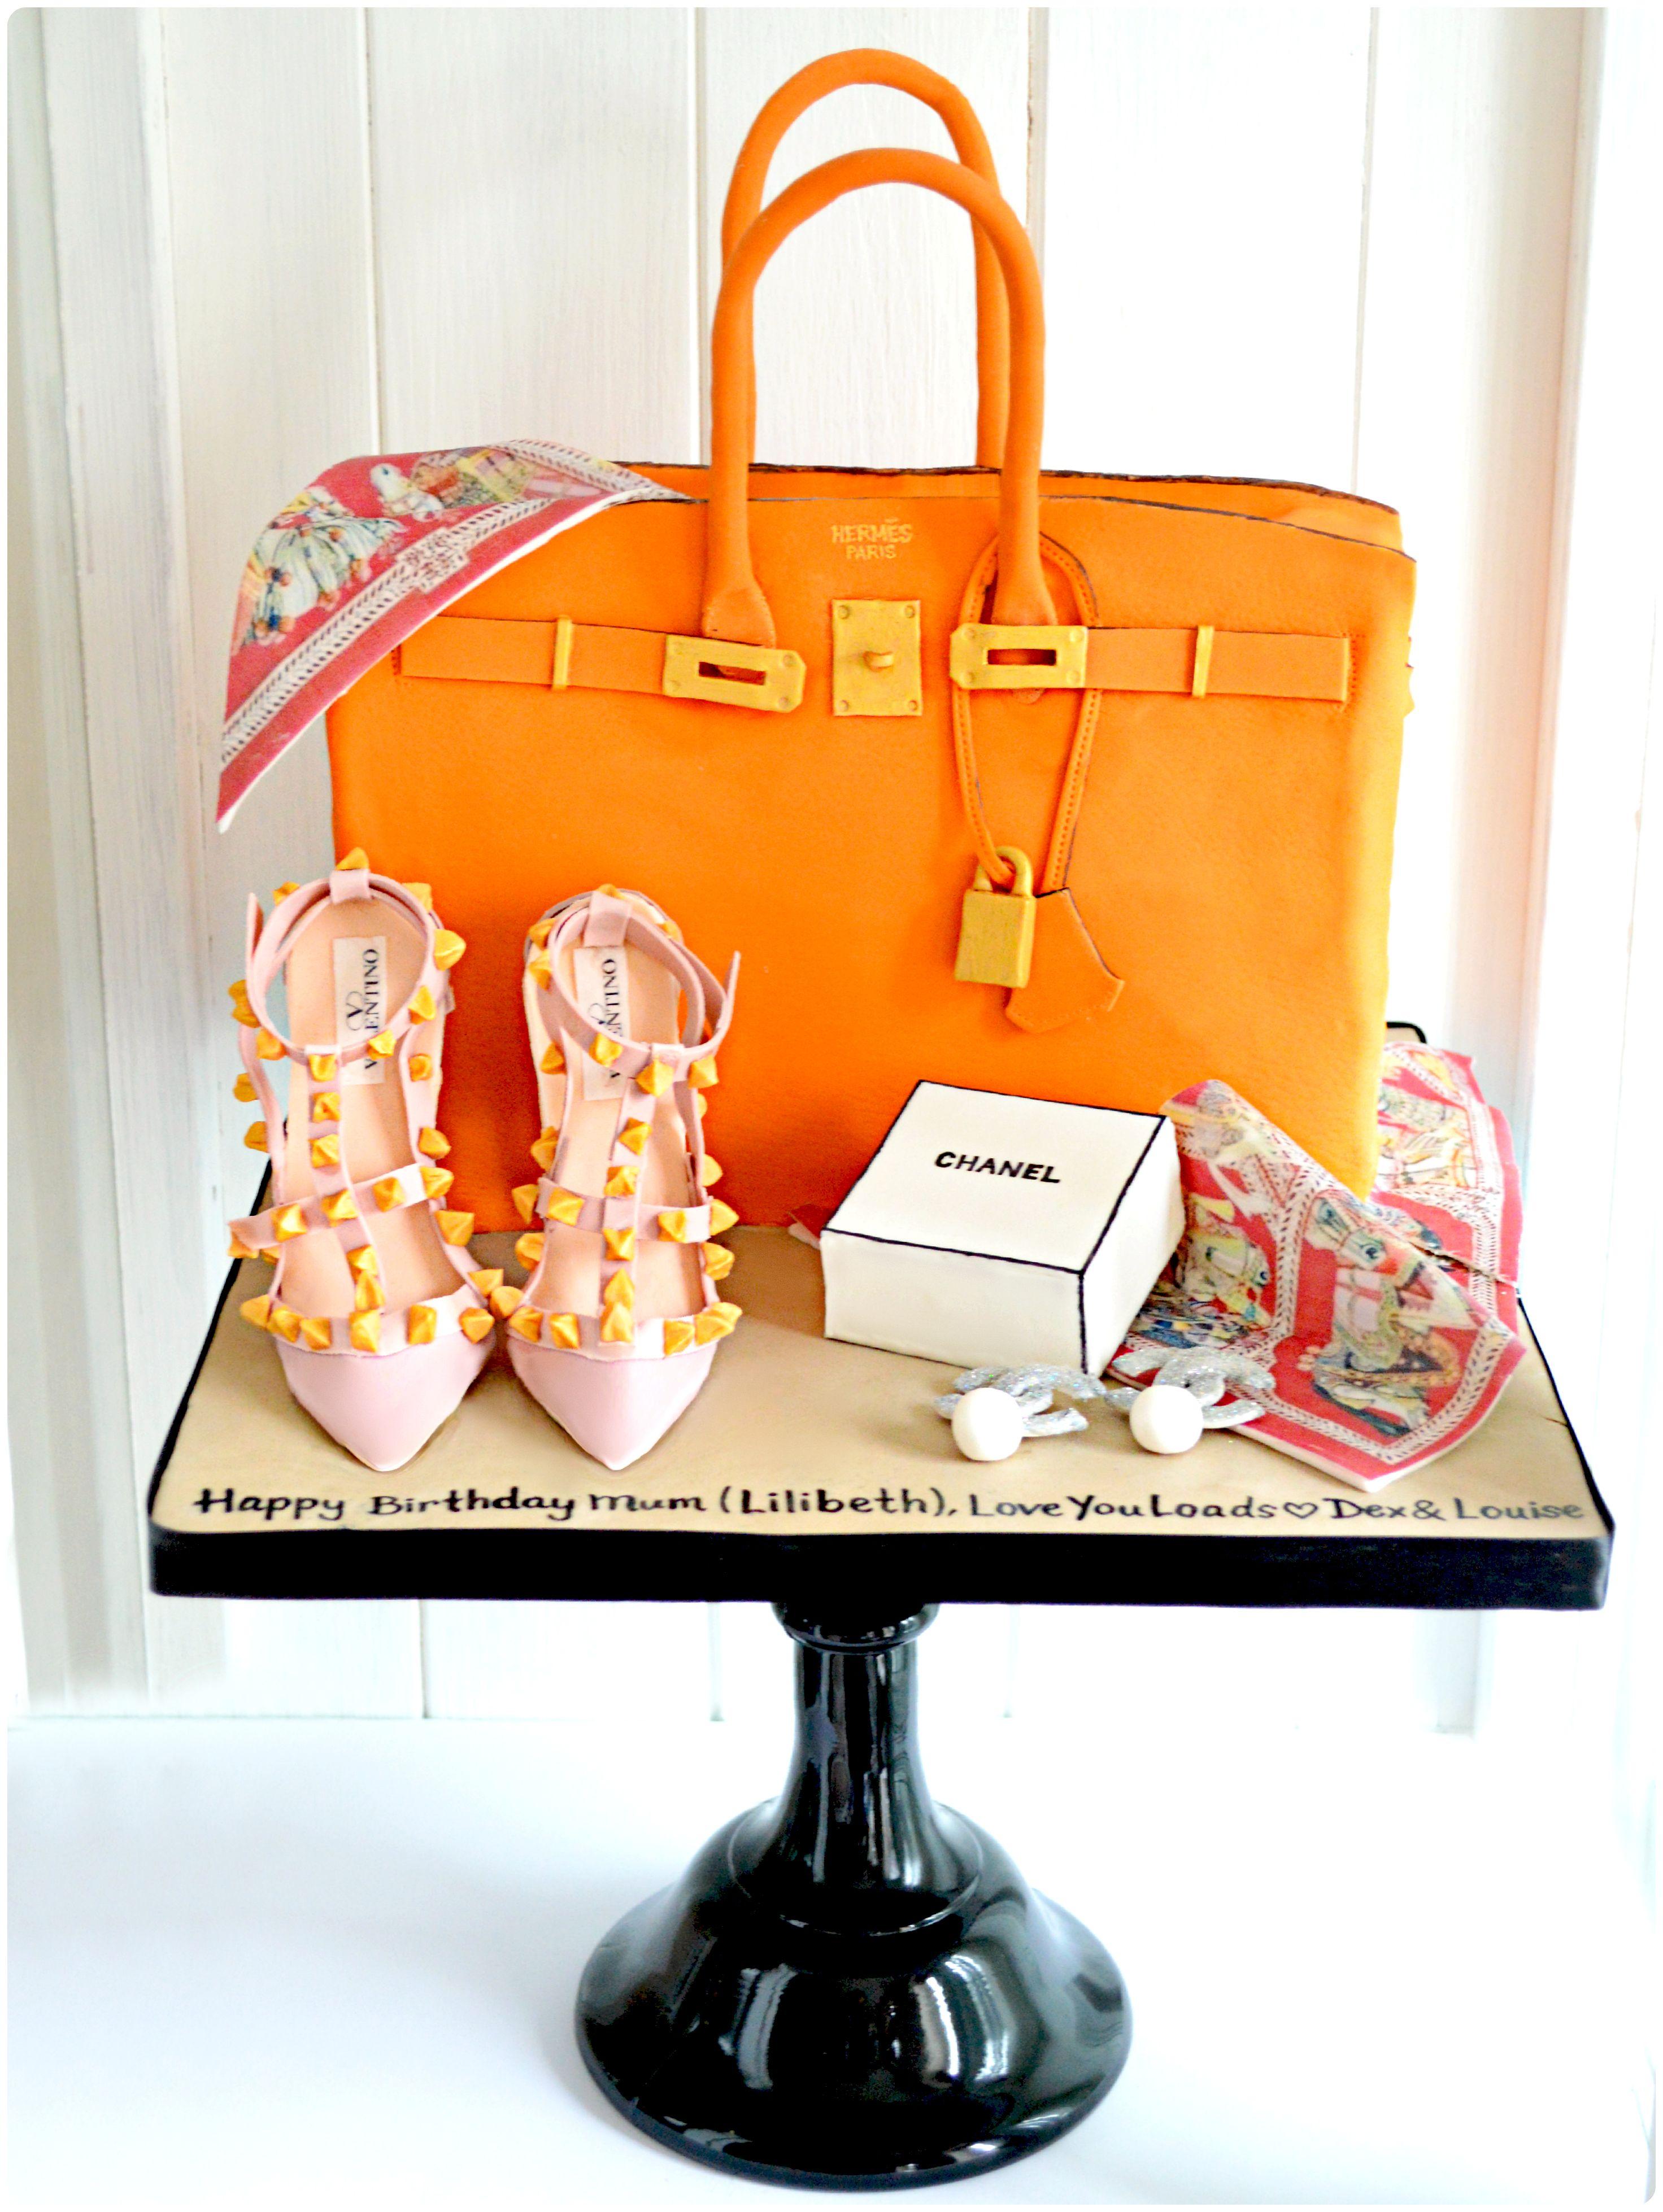 39776f731bf8 Orange Hermes Birkin Handbag Birthday Cake with Scarf and Fondant Sugar  Valentino Rockstud Pumps High Heel Shoes Chanel Pearl Earrings Jewelery Box  Cherie ...